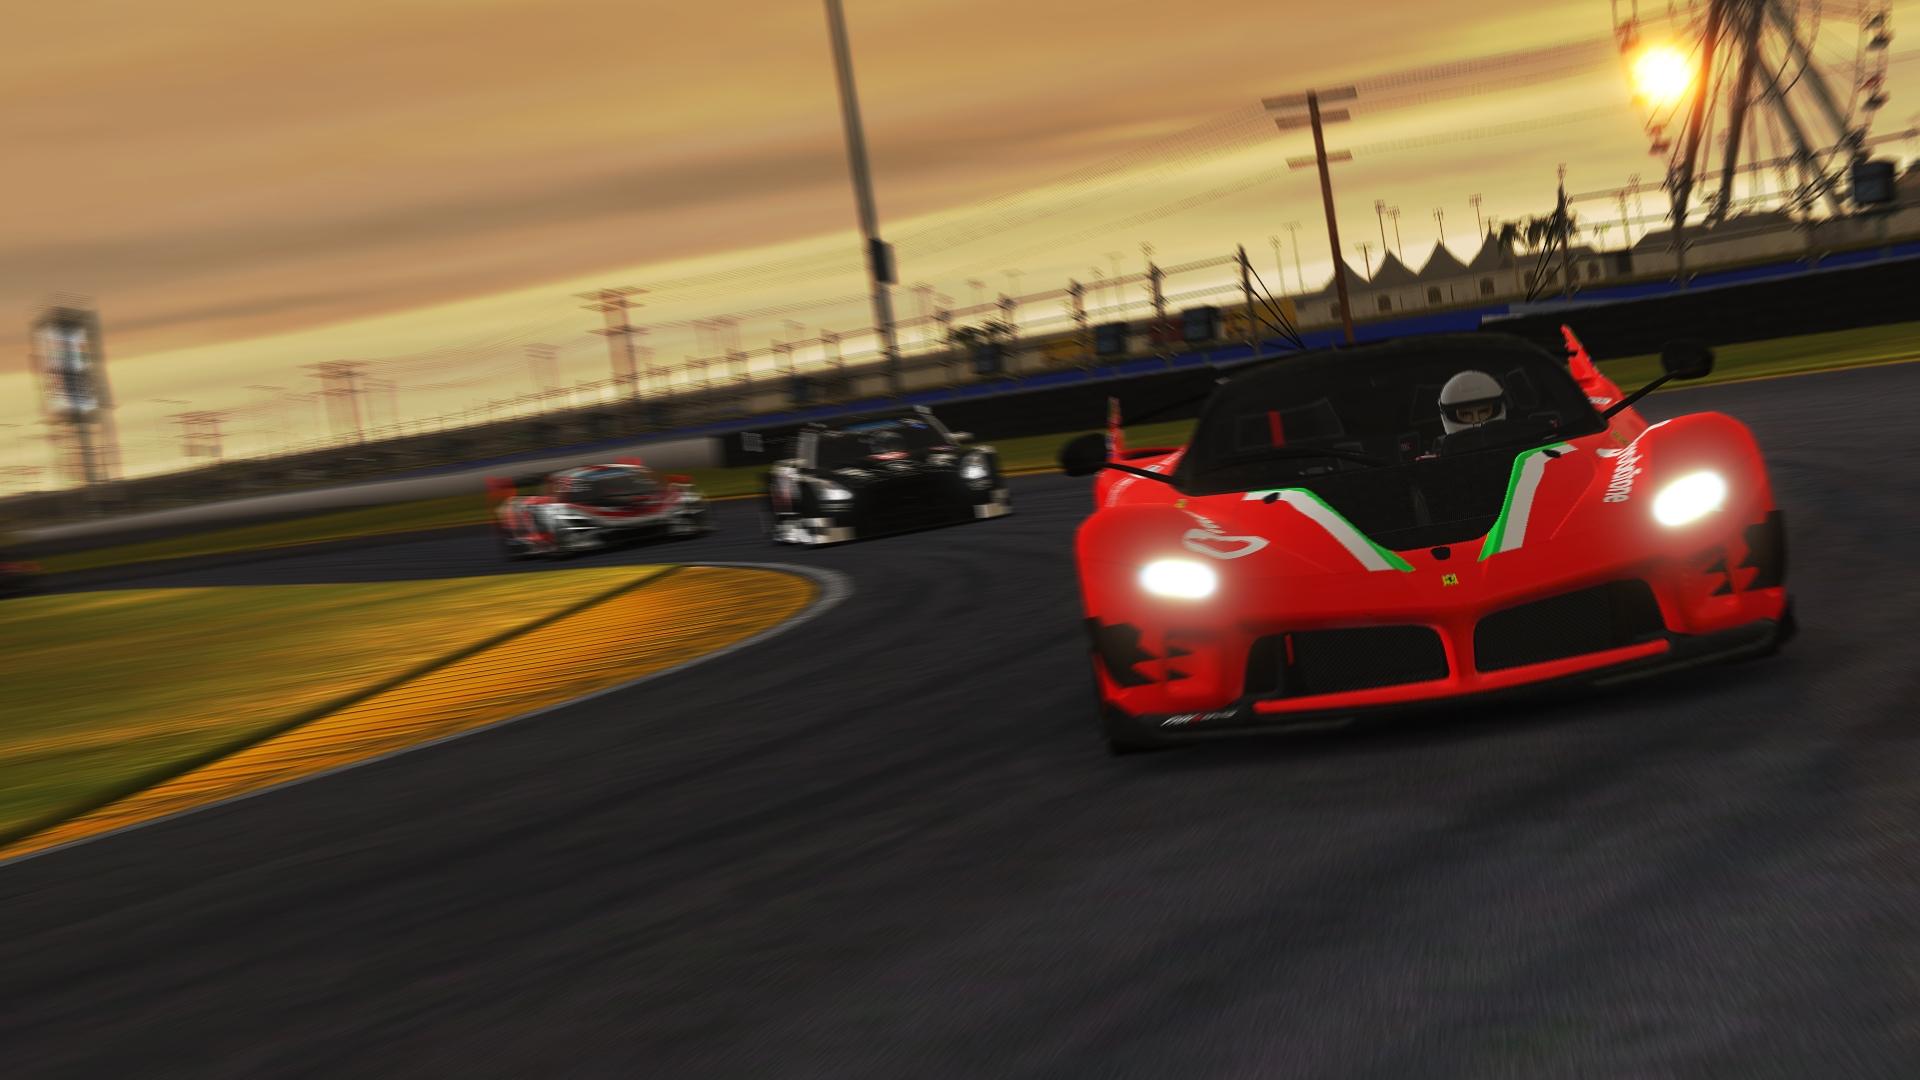 VWSC2021 Daytona Sat 2.jpg